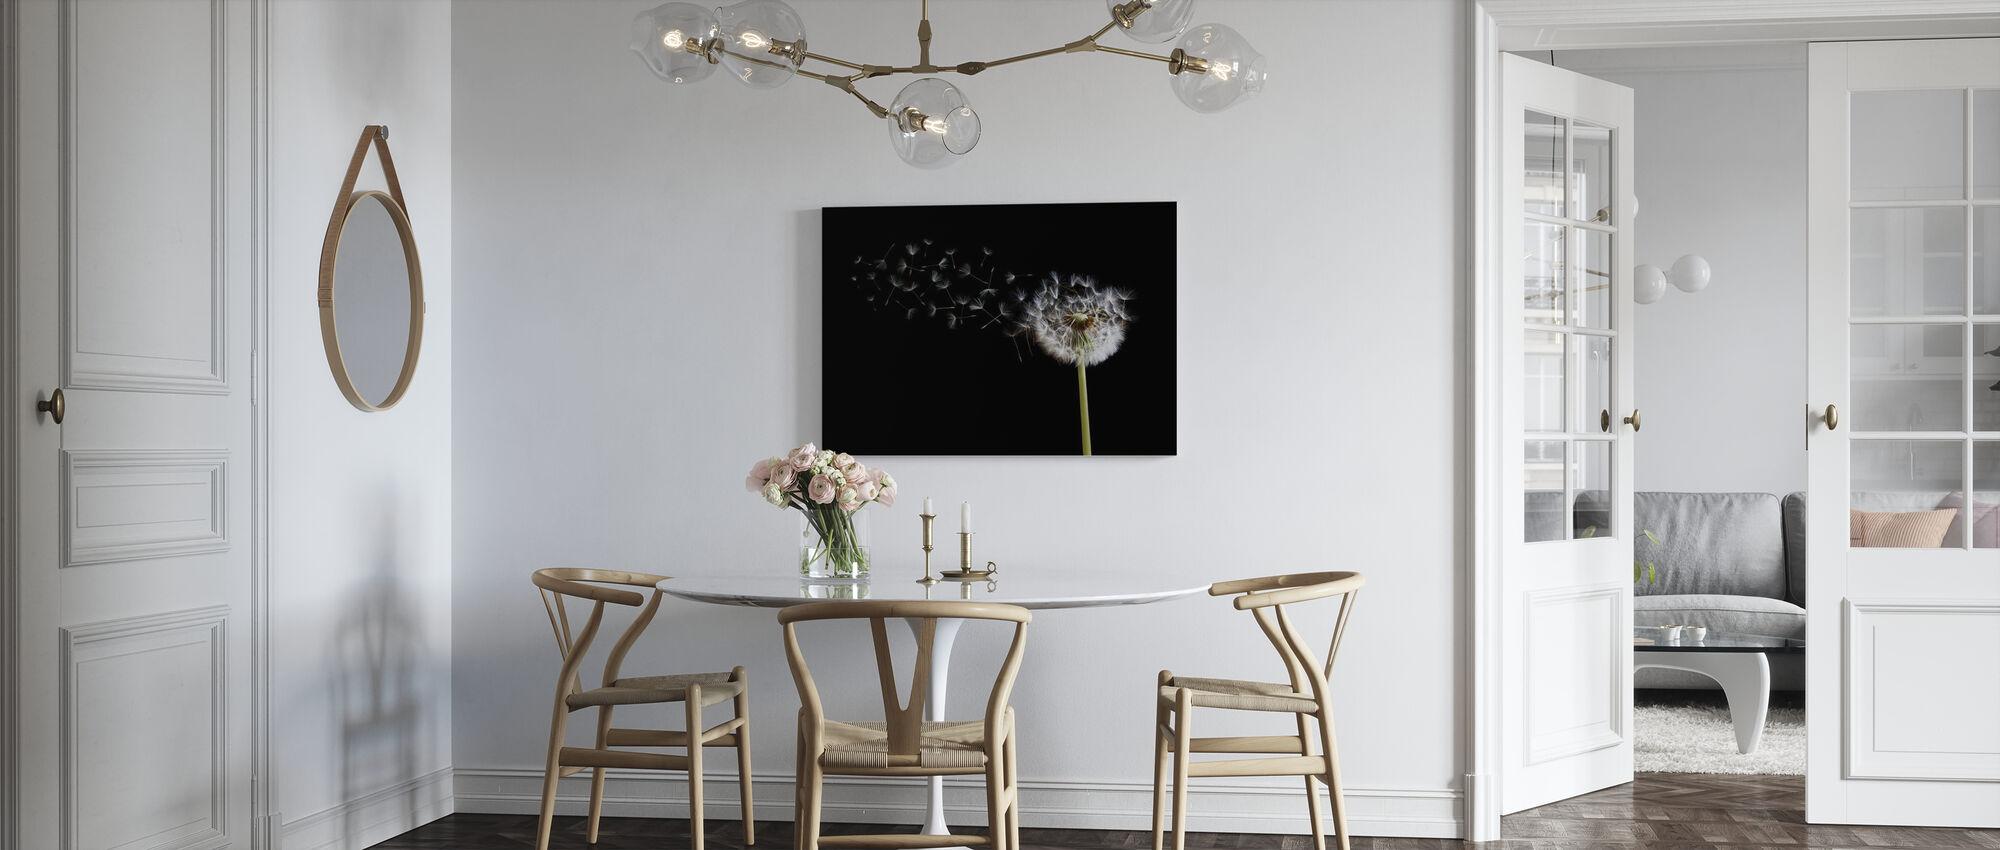 Dandelion Seeds in the Wind - Canvas print - Kitchen